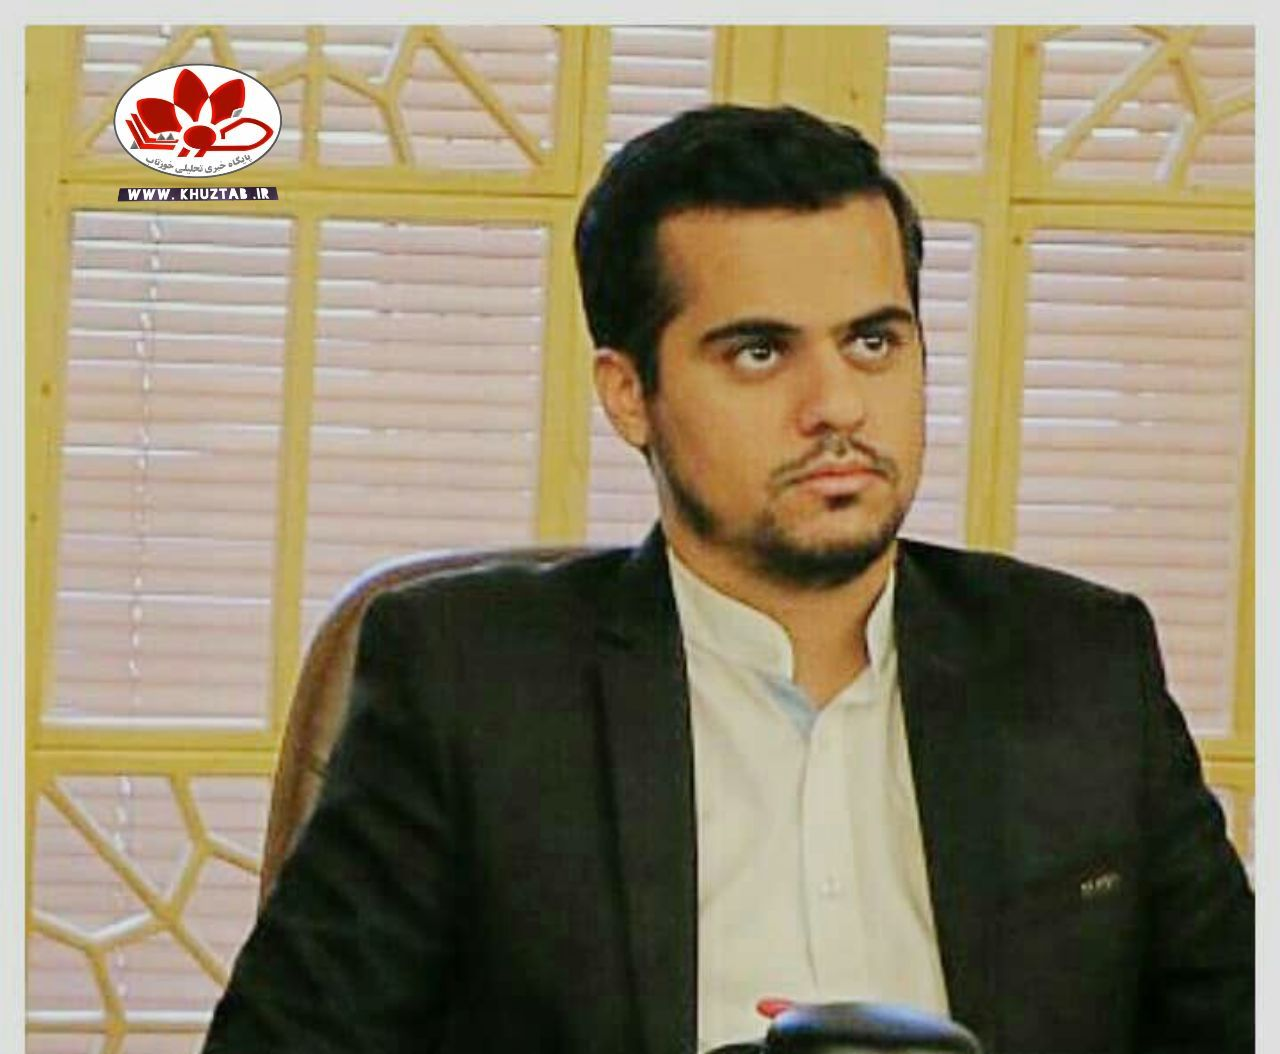 IMG 20200103 005656 822 افسردگی سیاسی و آینده ایران